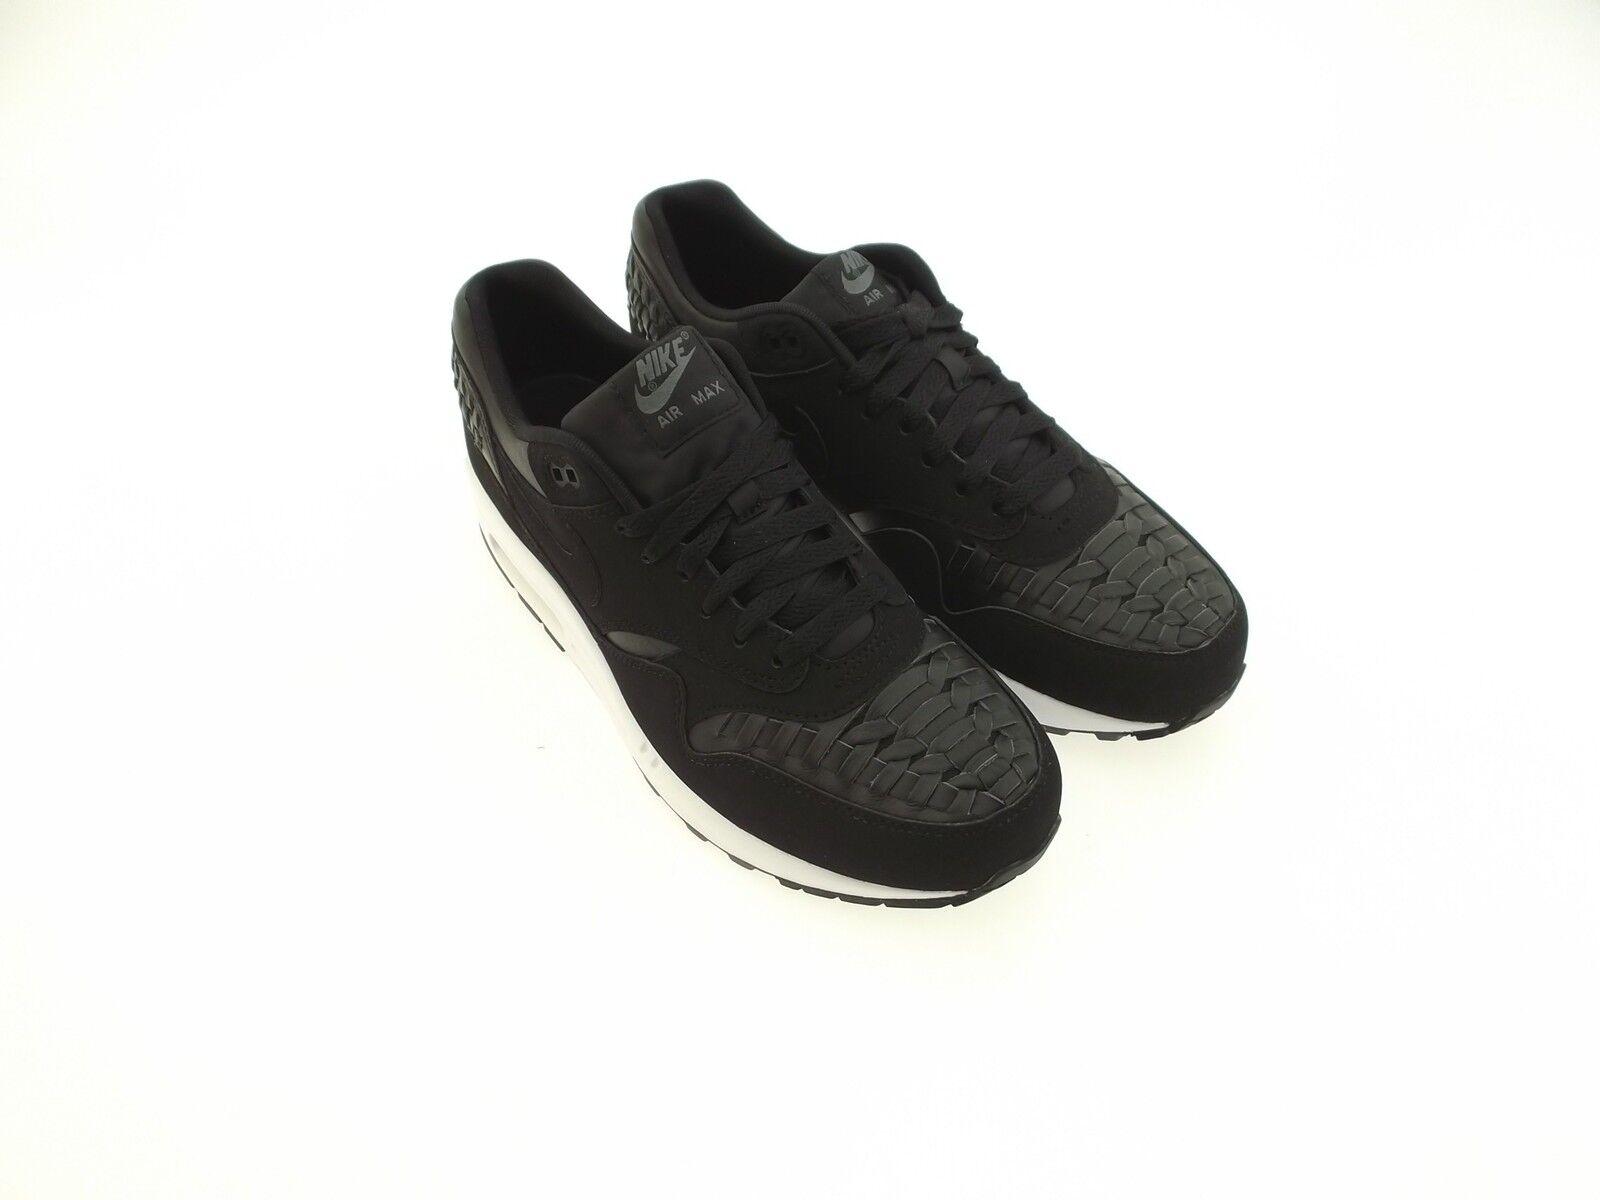 Nike Hombres Blanca Max 1 Tejida Negra Blanca Hombres Air 22690a